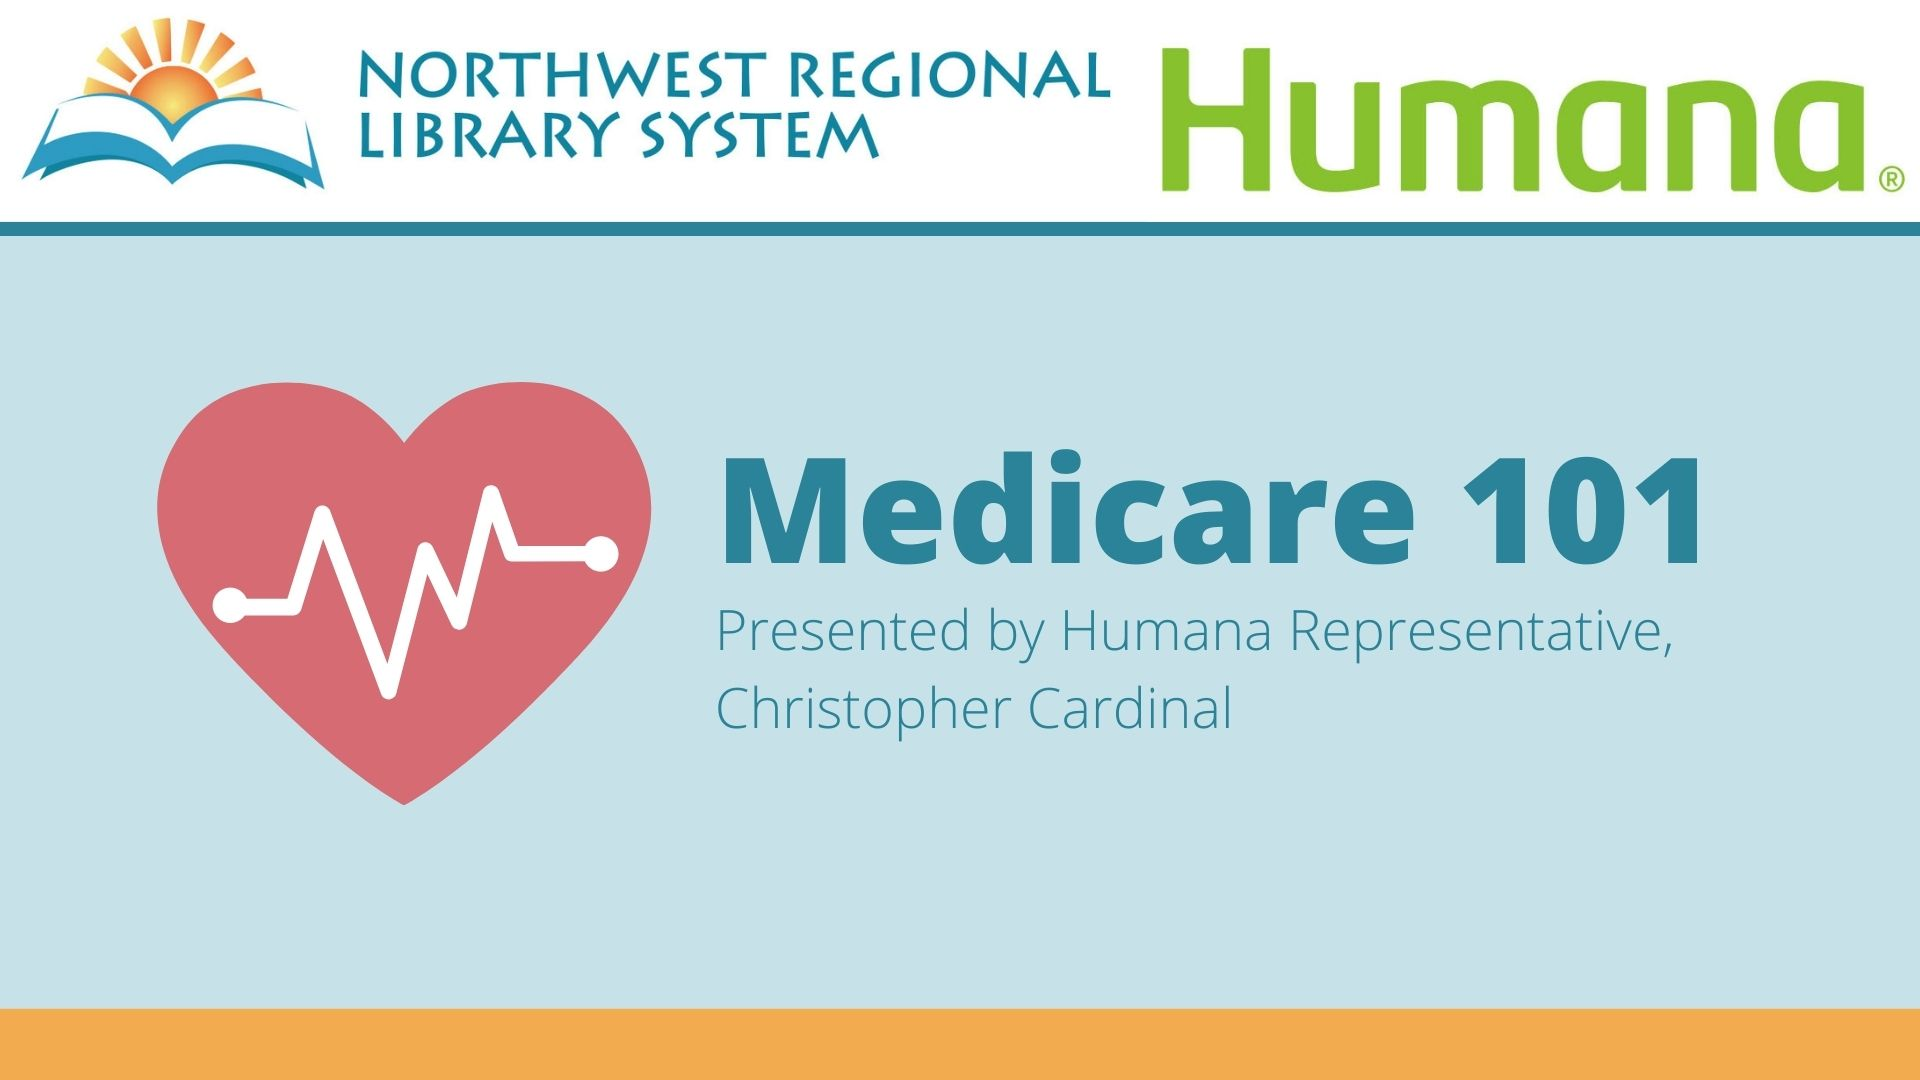 Medicare program presented by humana